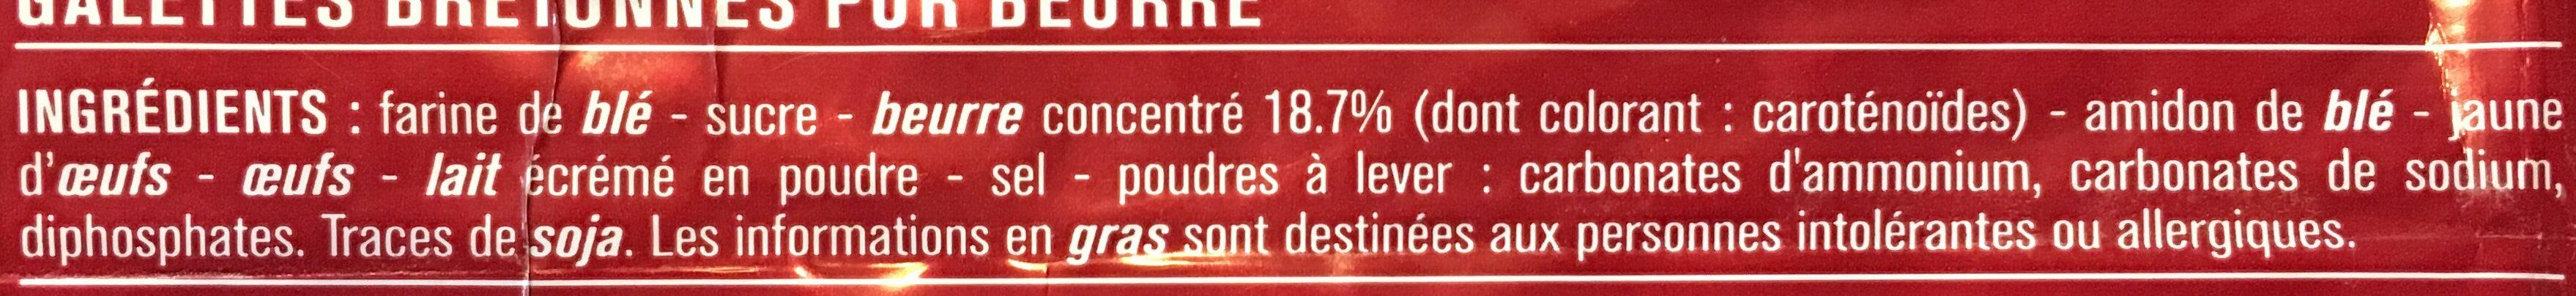 Galettes bretonnes pur beurre - 成分 - fr